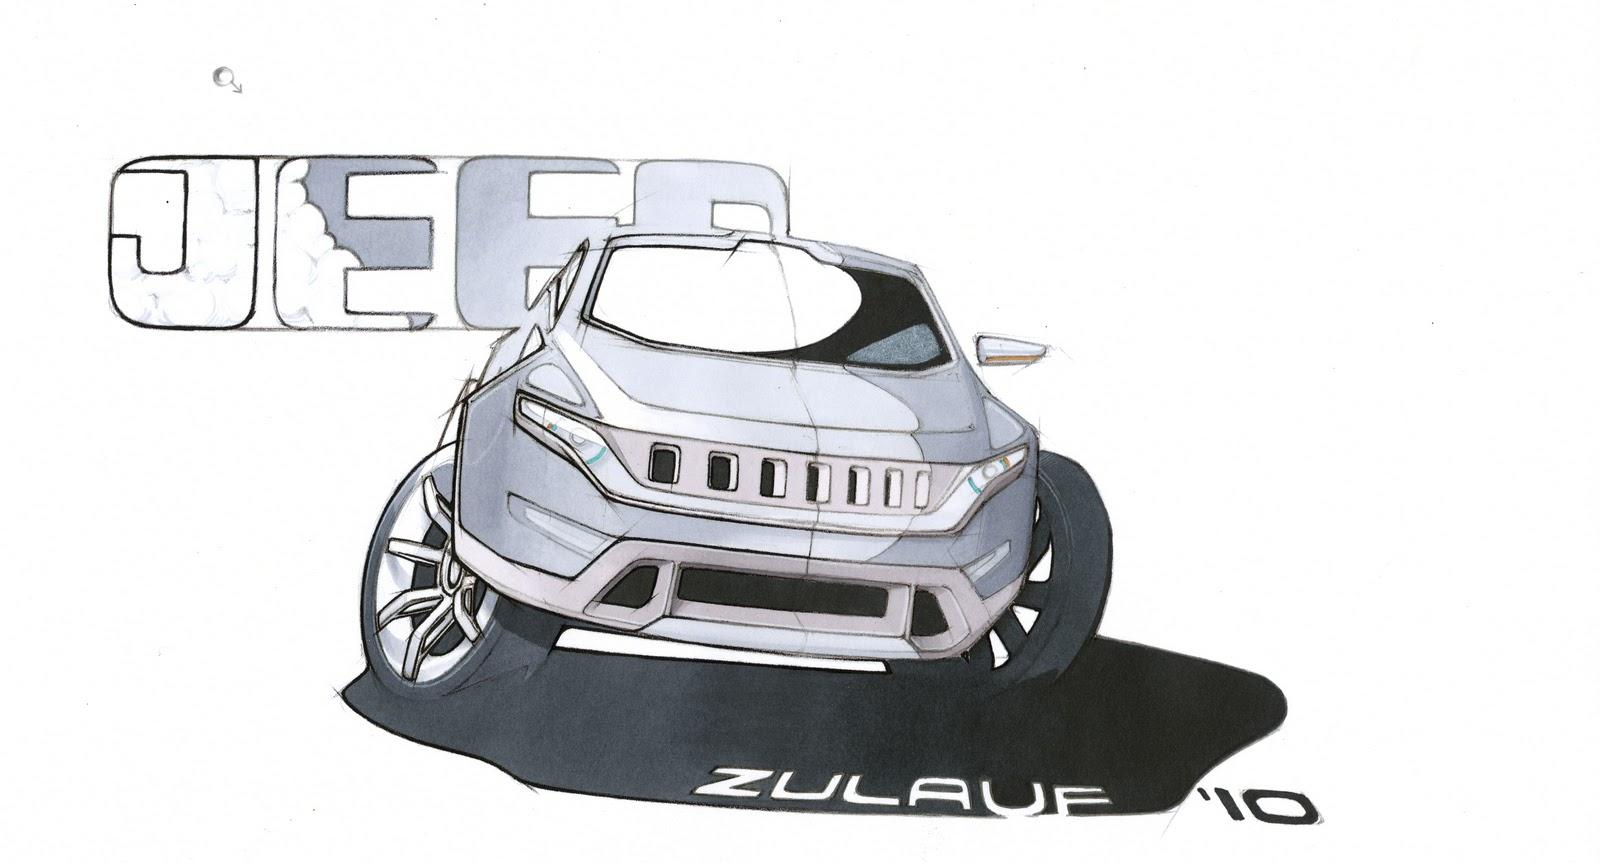 Jeep design #1